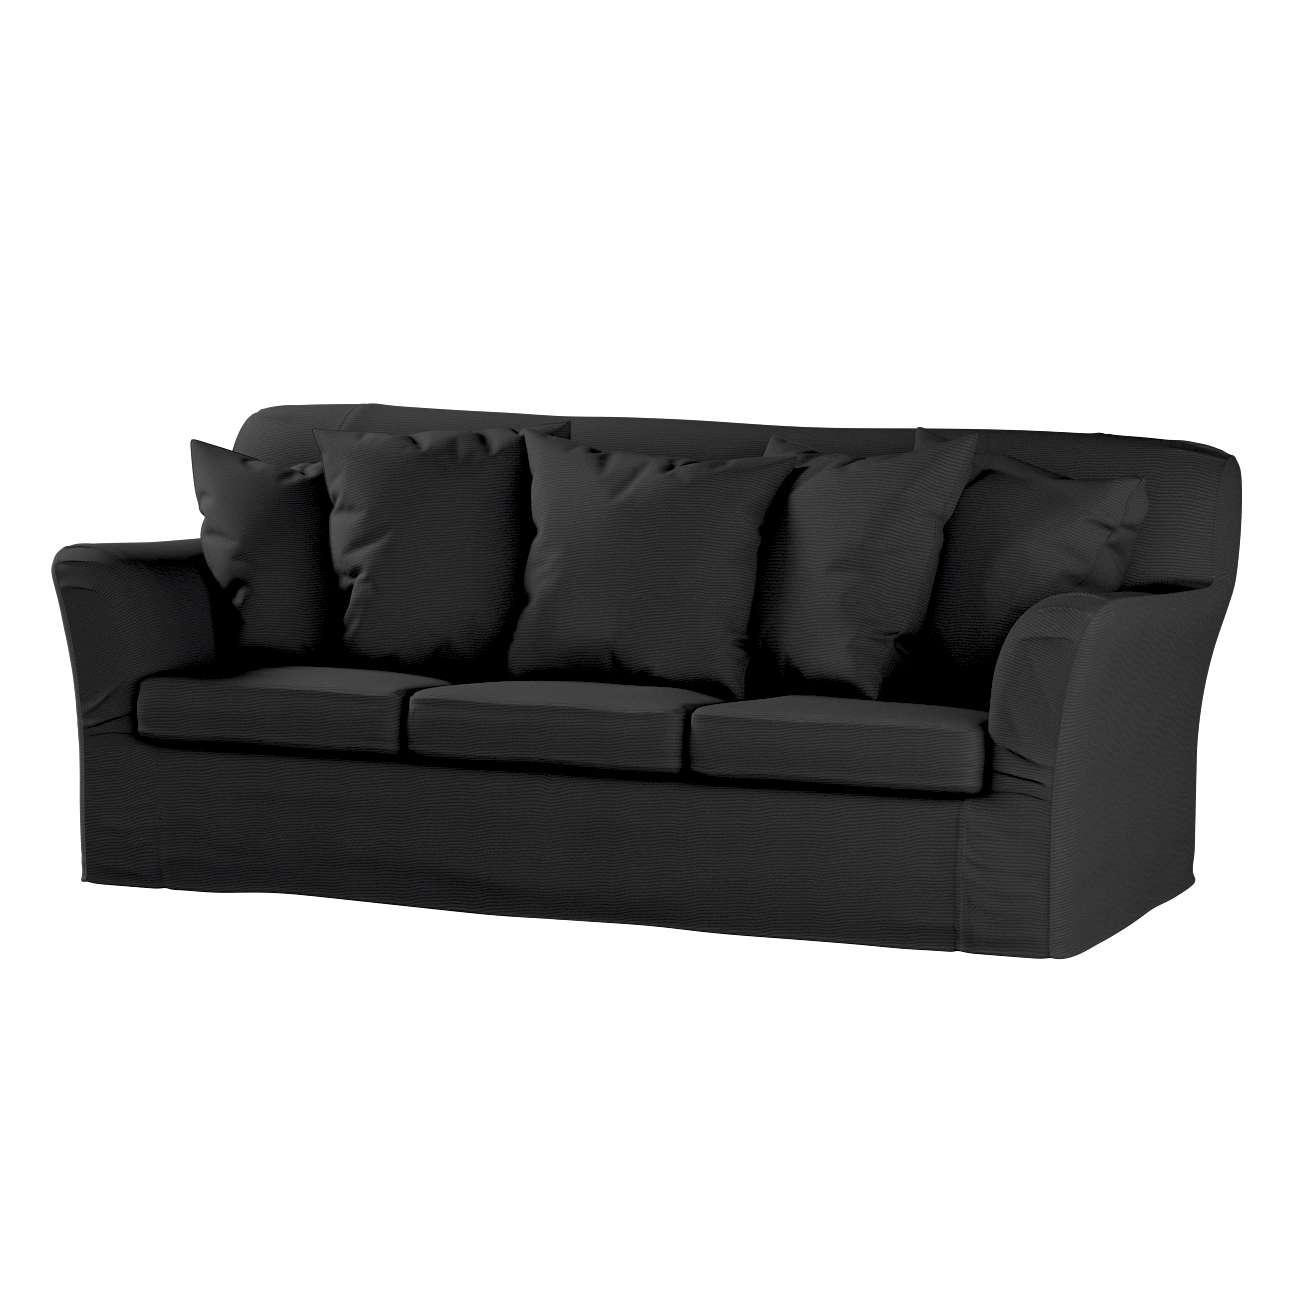 TOMELILLA  trivietės sofos užvalkalas TOMELILLA trivietė sofa kolekcijoje Etna , audinys: 705-00